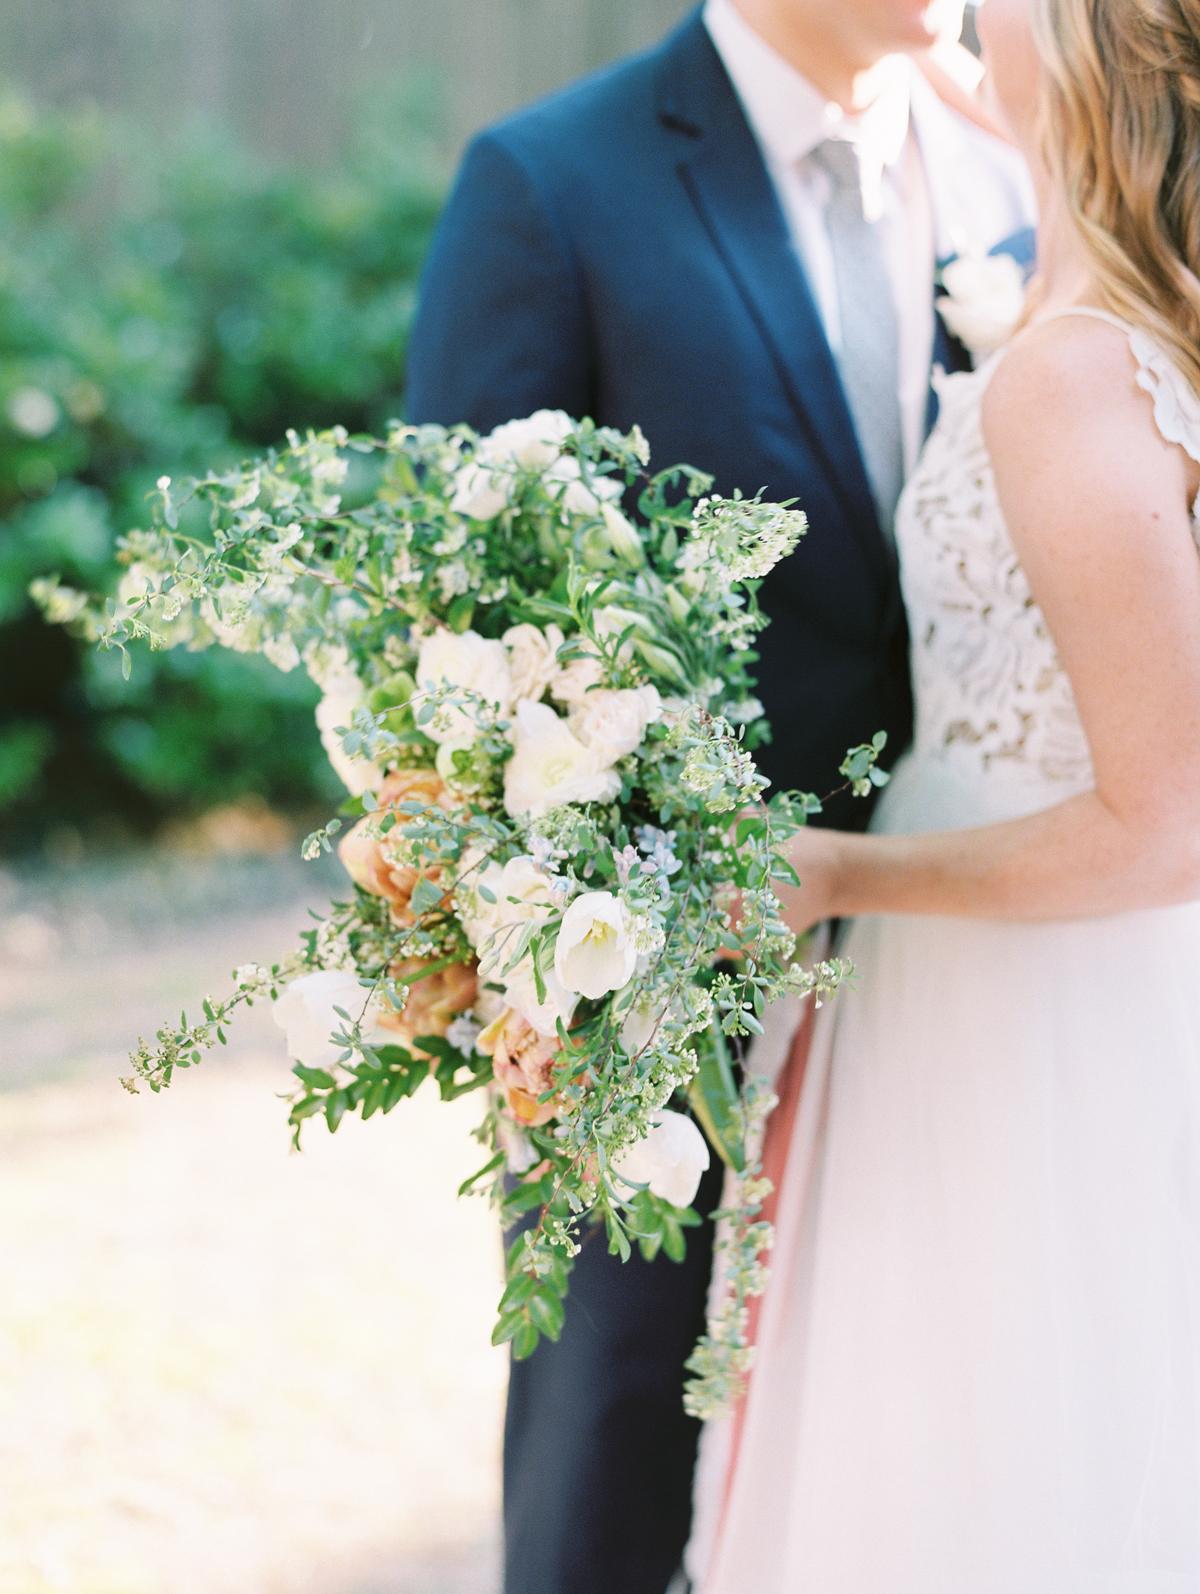 Foundry-At-Puritan-Mill-wedding-photos-venue-atlanta-fine-art-film-photographer45.JPG